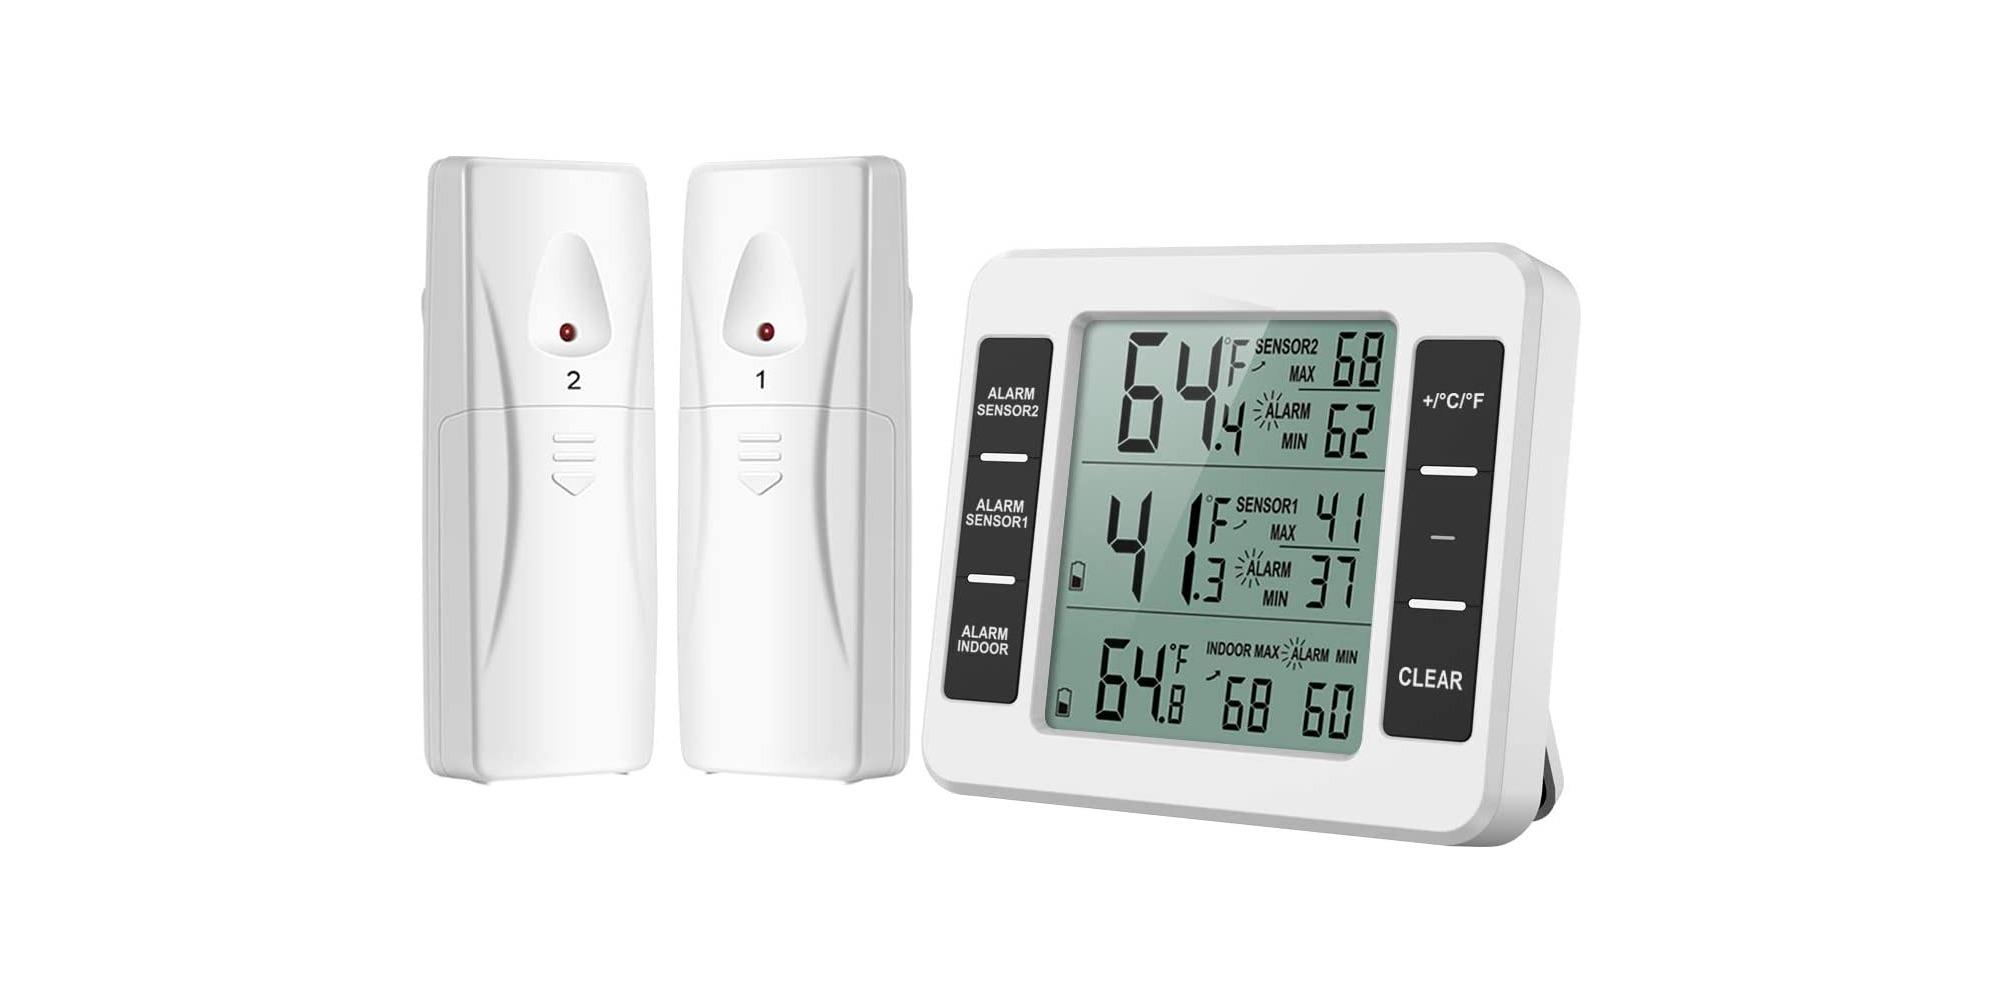 Refrigerator Thermometers Kitchen & Dining Refrigerator ...